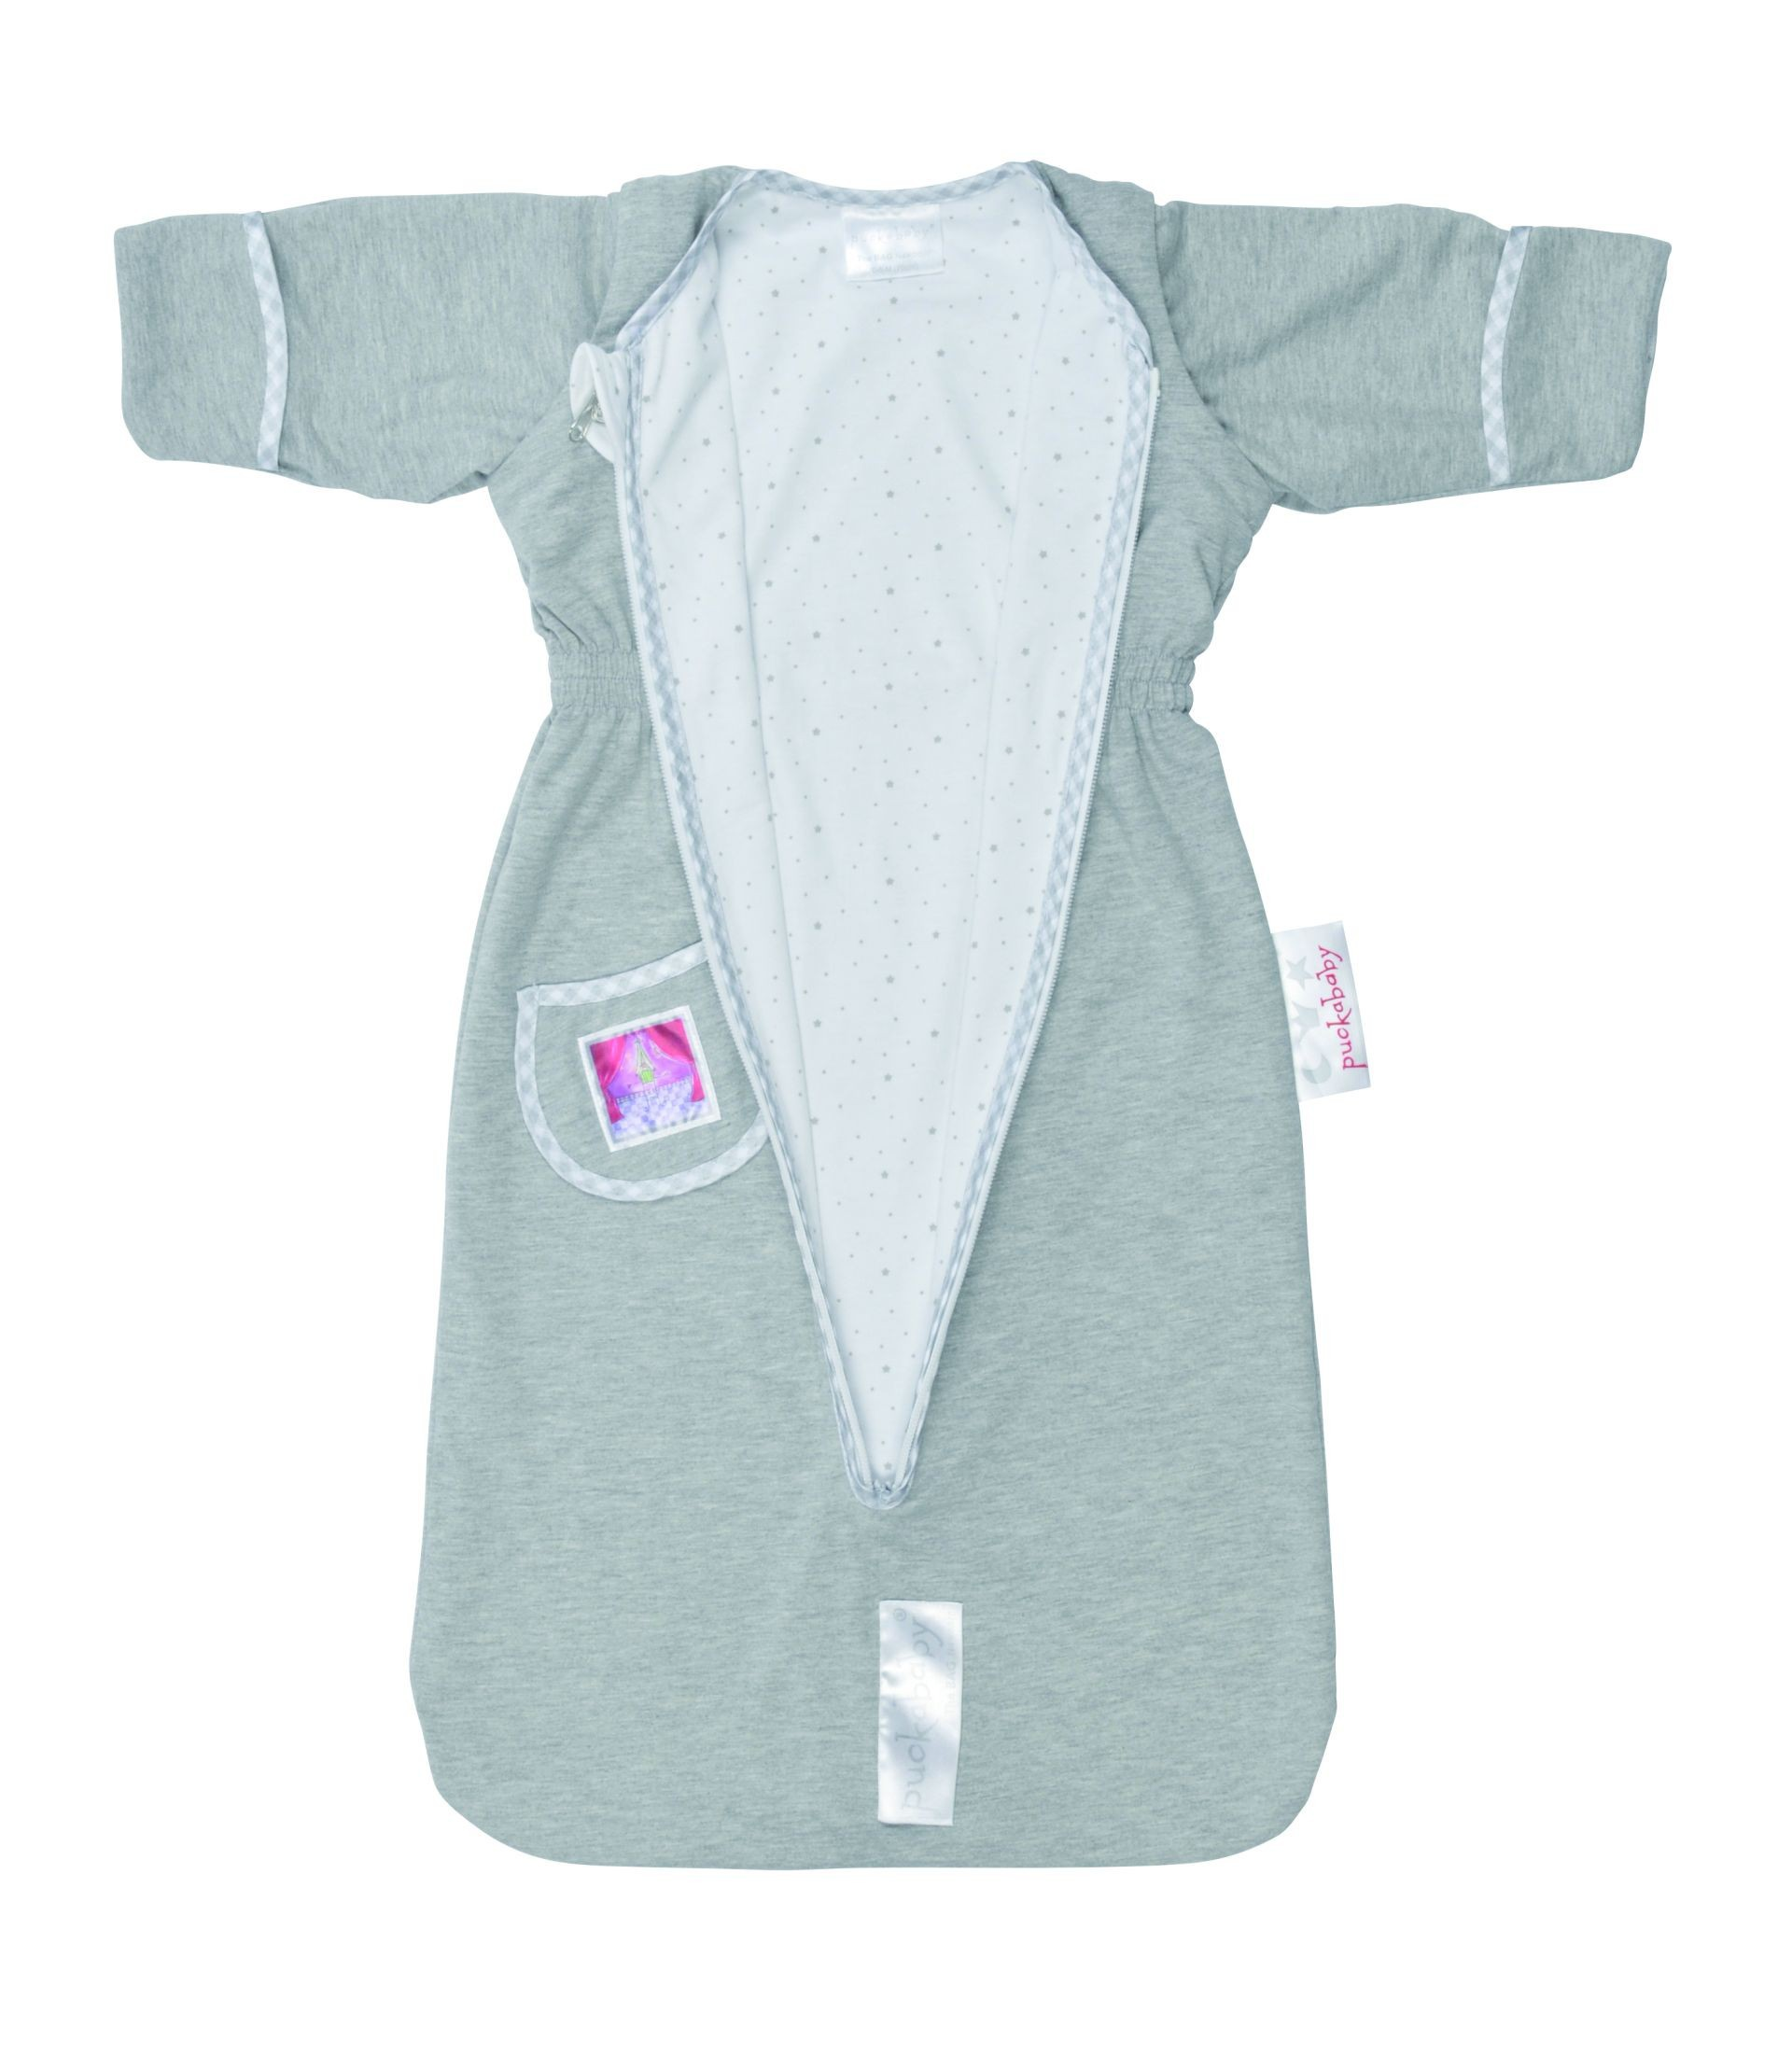 Puckababy Schlafsack The Bag Newborn Grey uni